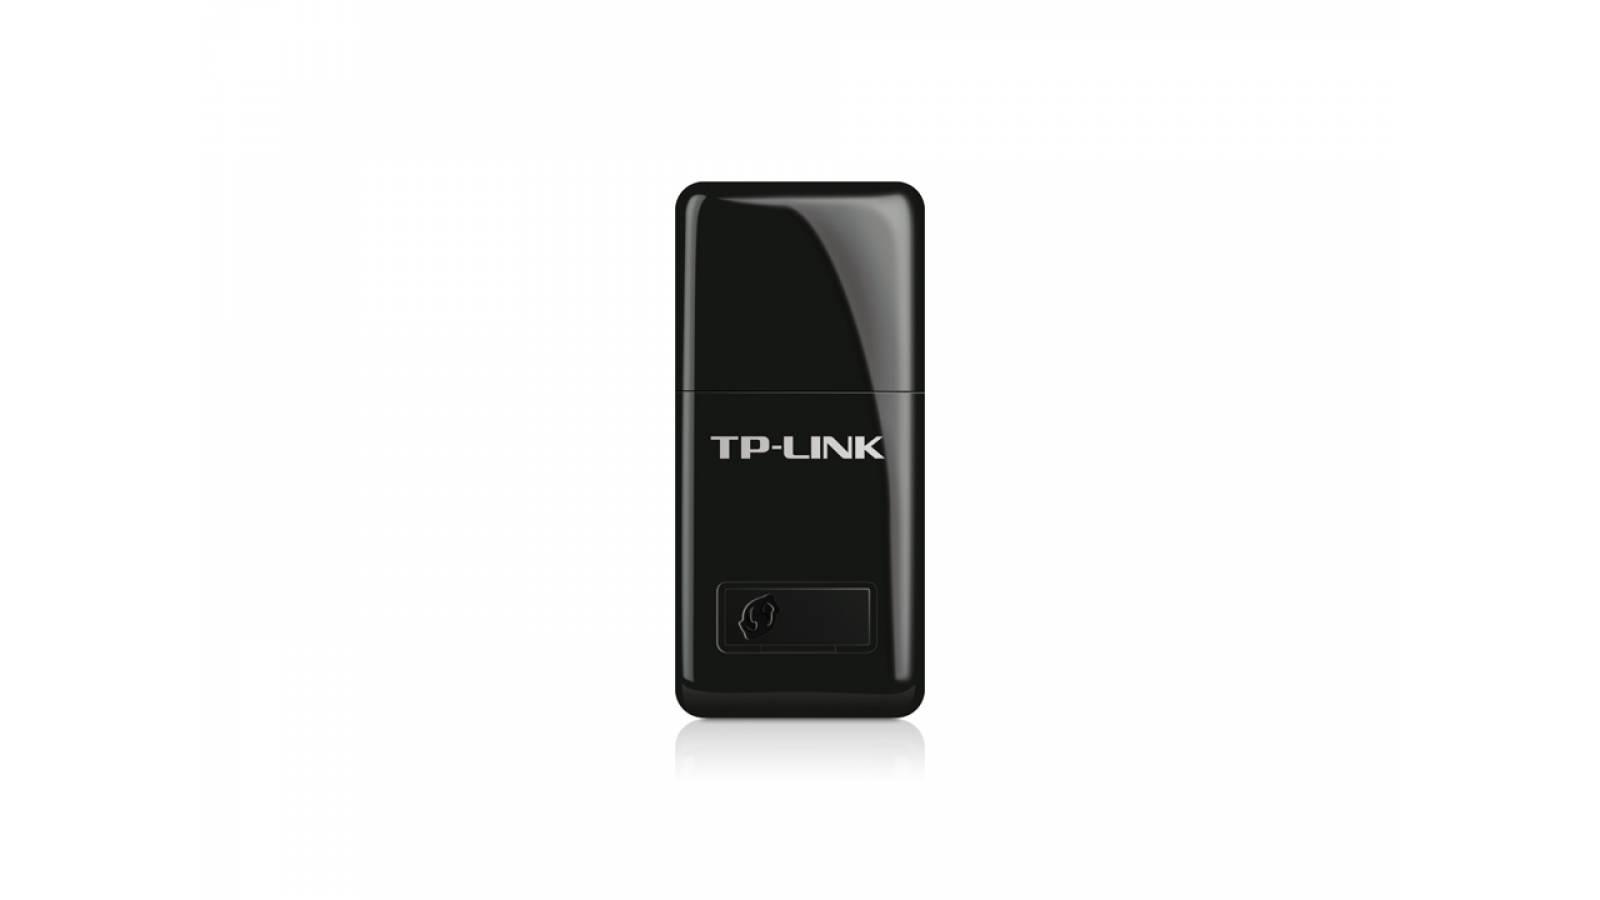 TARJETA RED USB TP-LINK TL-WN823N 300MBPS